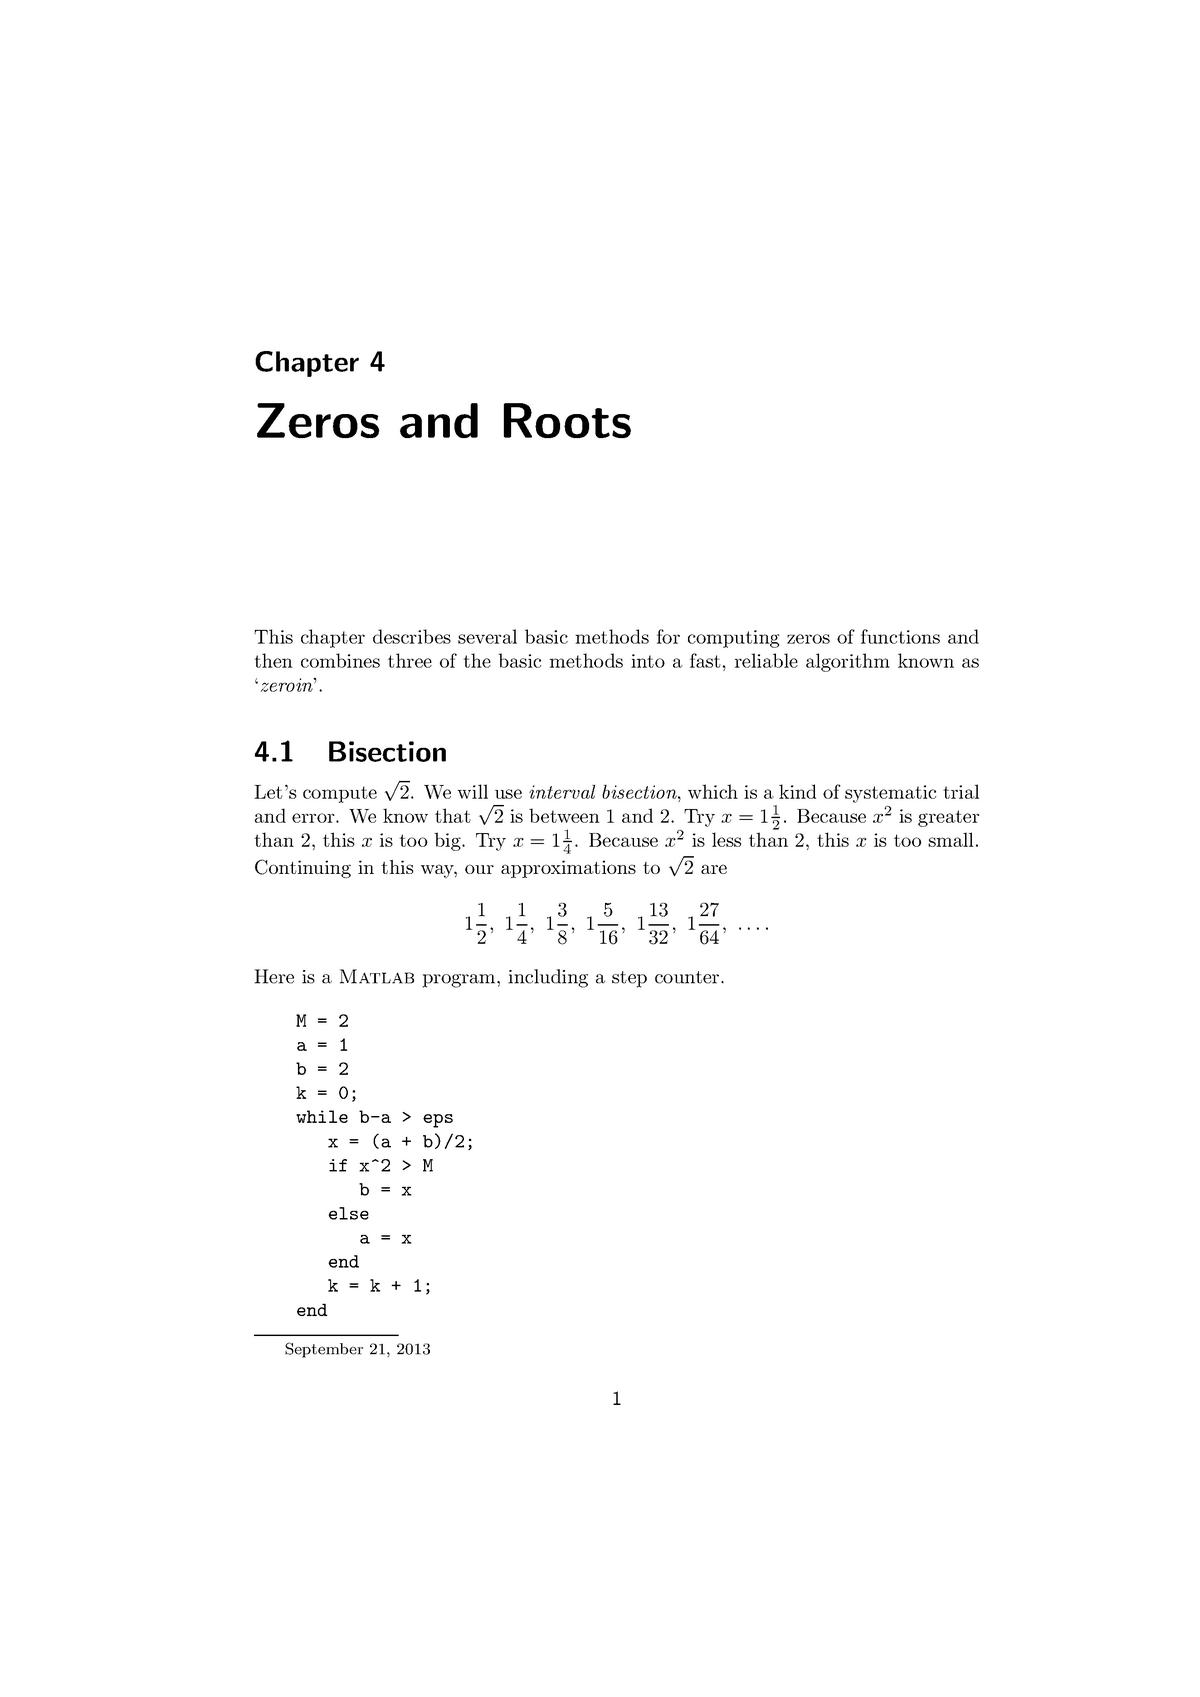 Zeros and Roots - Matlab in Engineering Mechanics ME41060